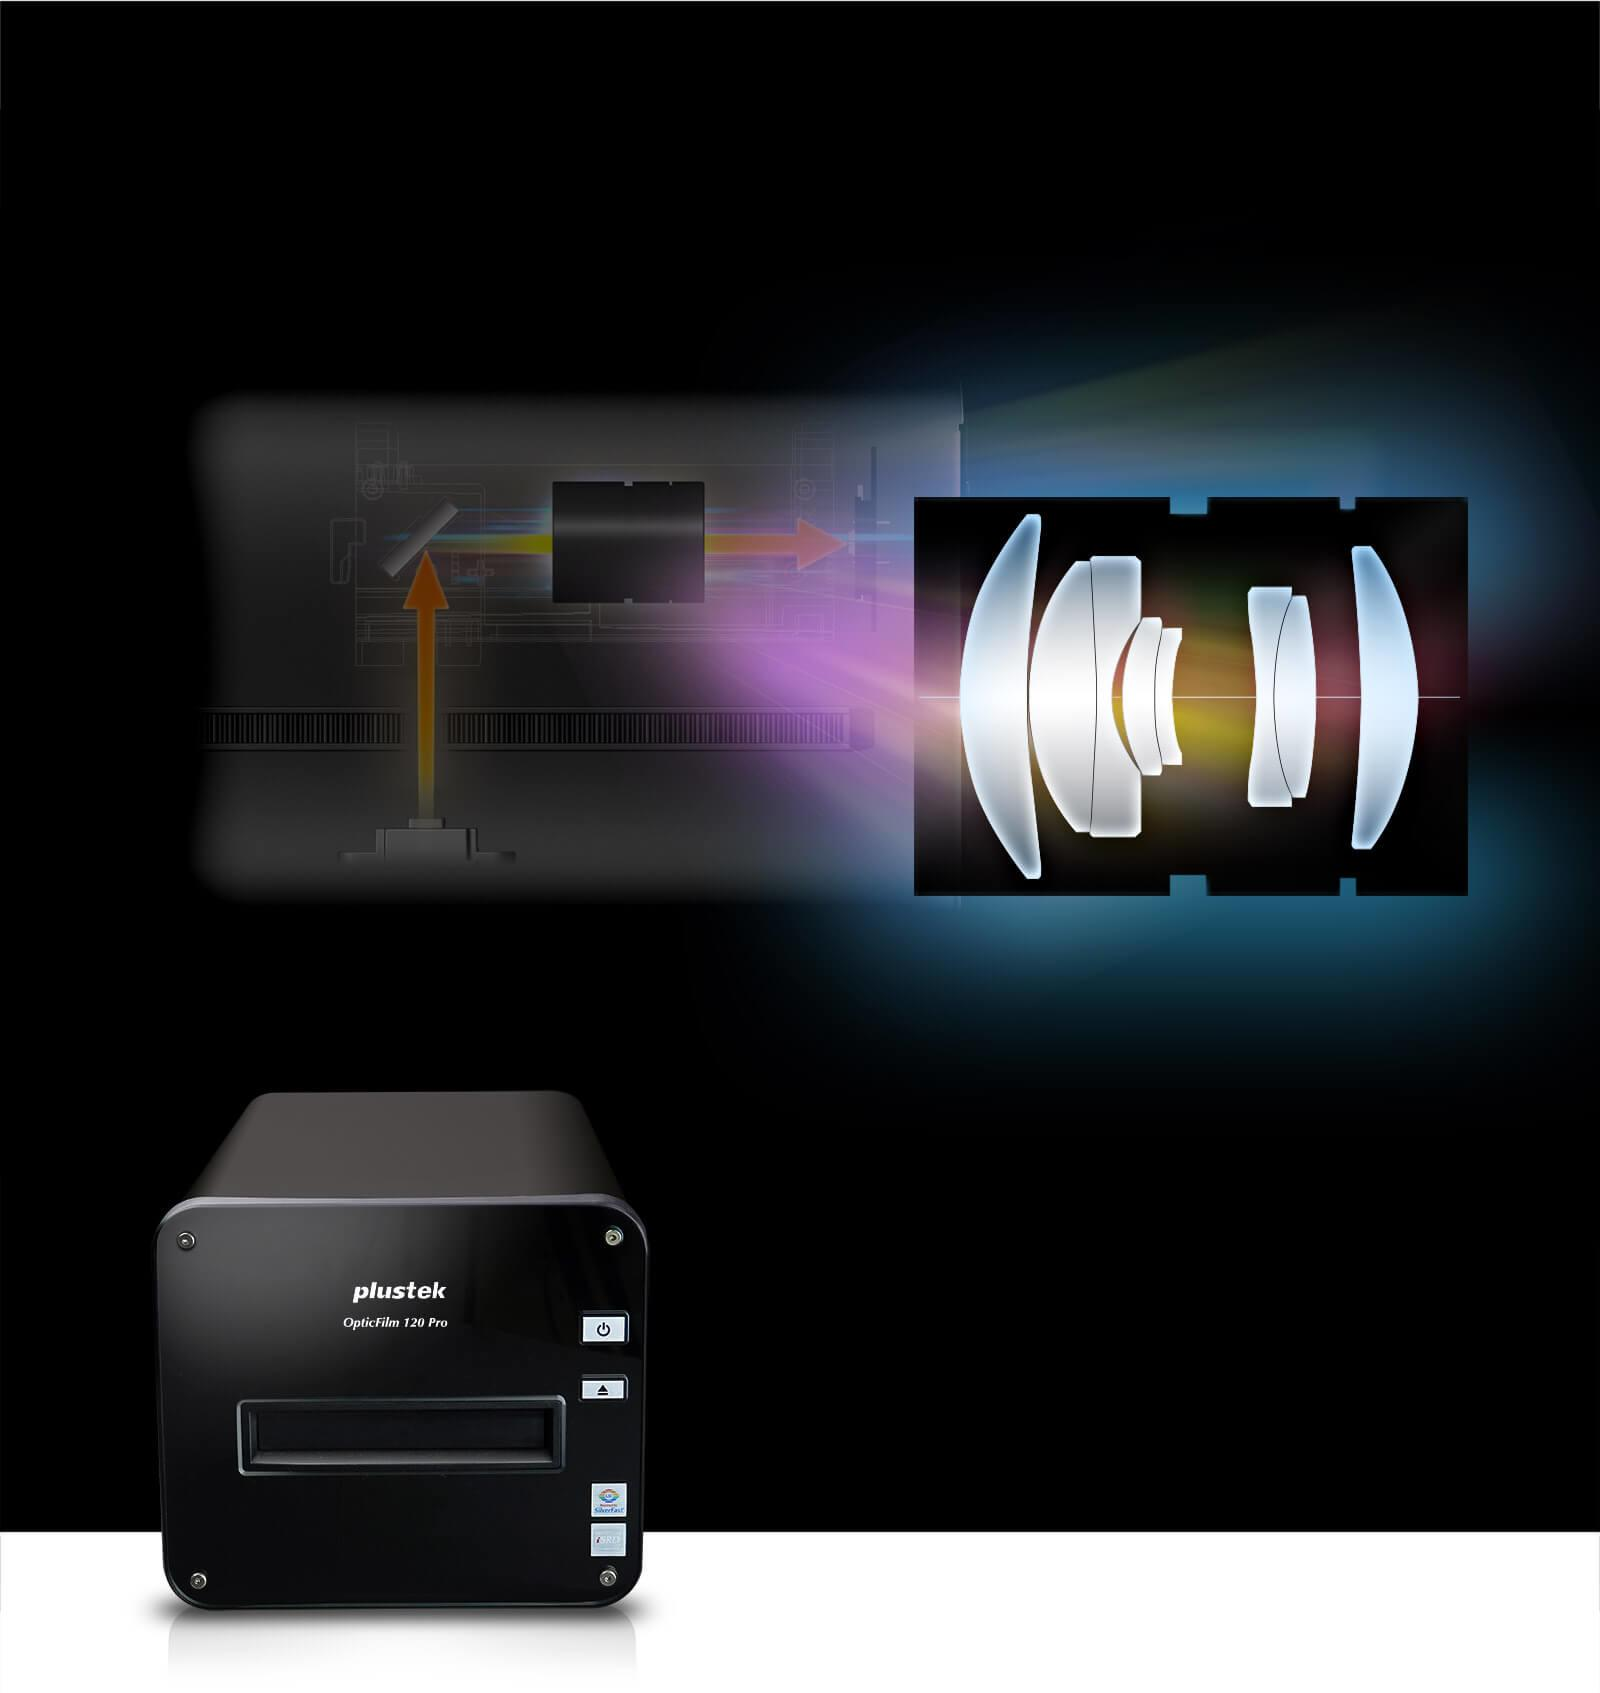 of120pro-optical.jpg